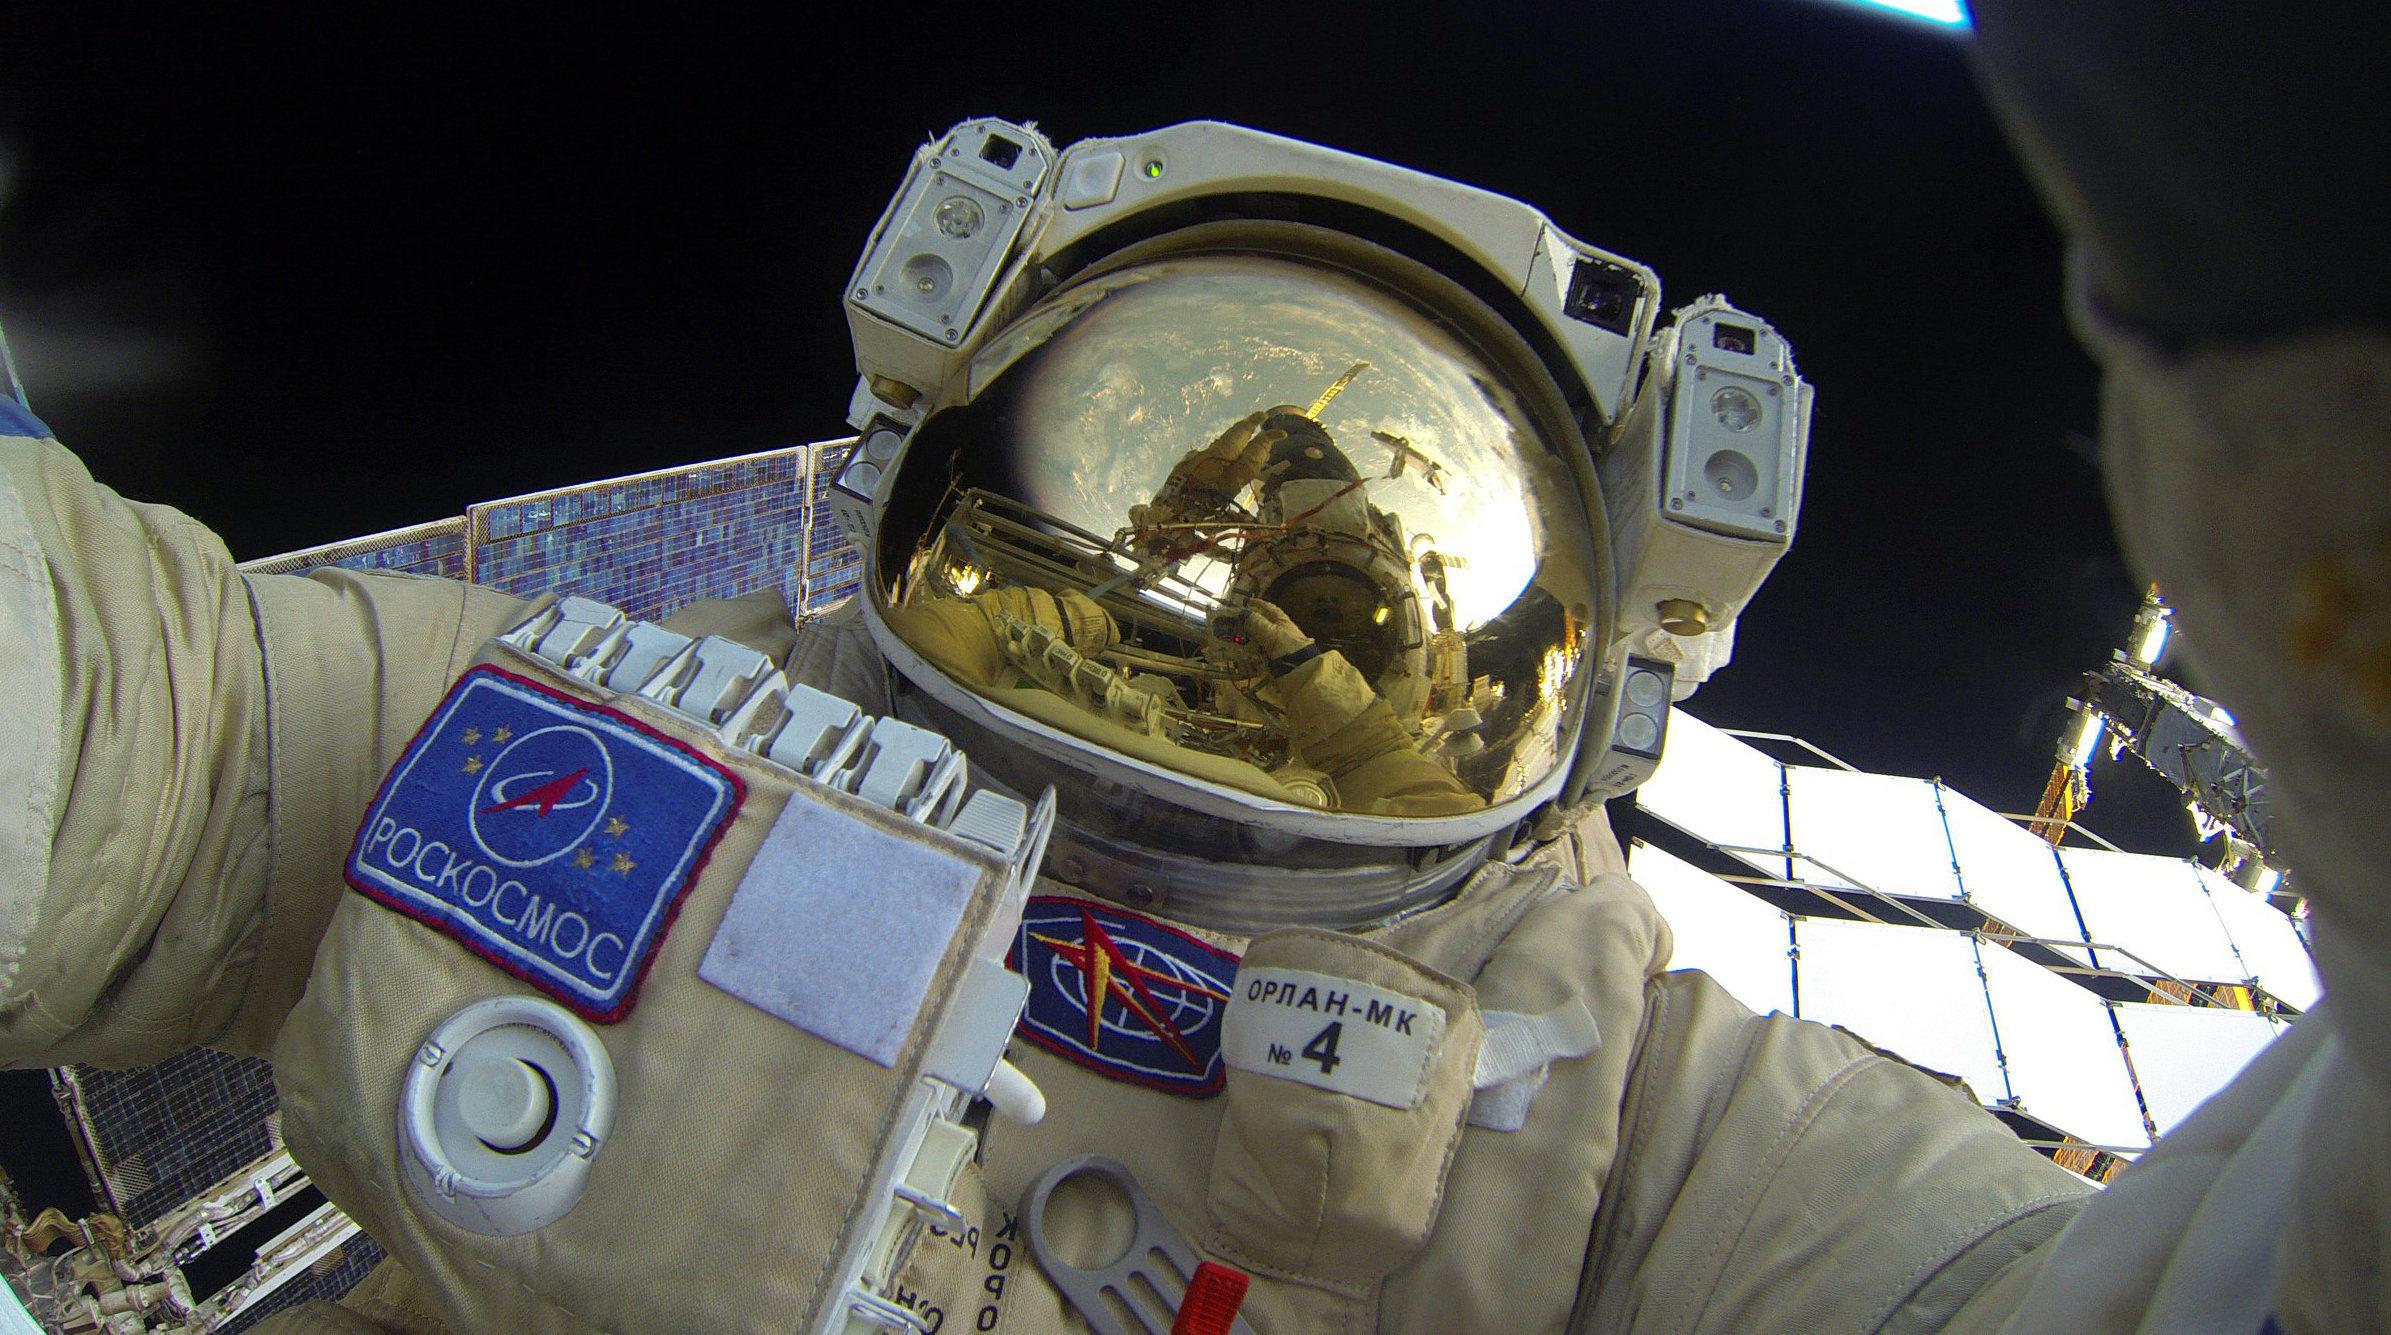 Roskosmos Cosmonauts Sergei Volkov and Yury Malenchenko performing extravehicular activities on February 3, 2016